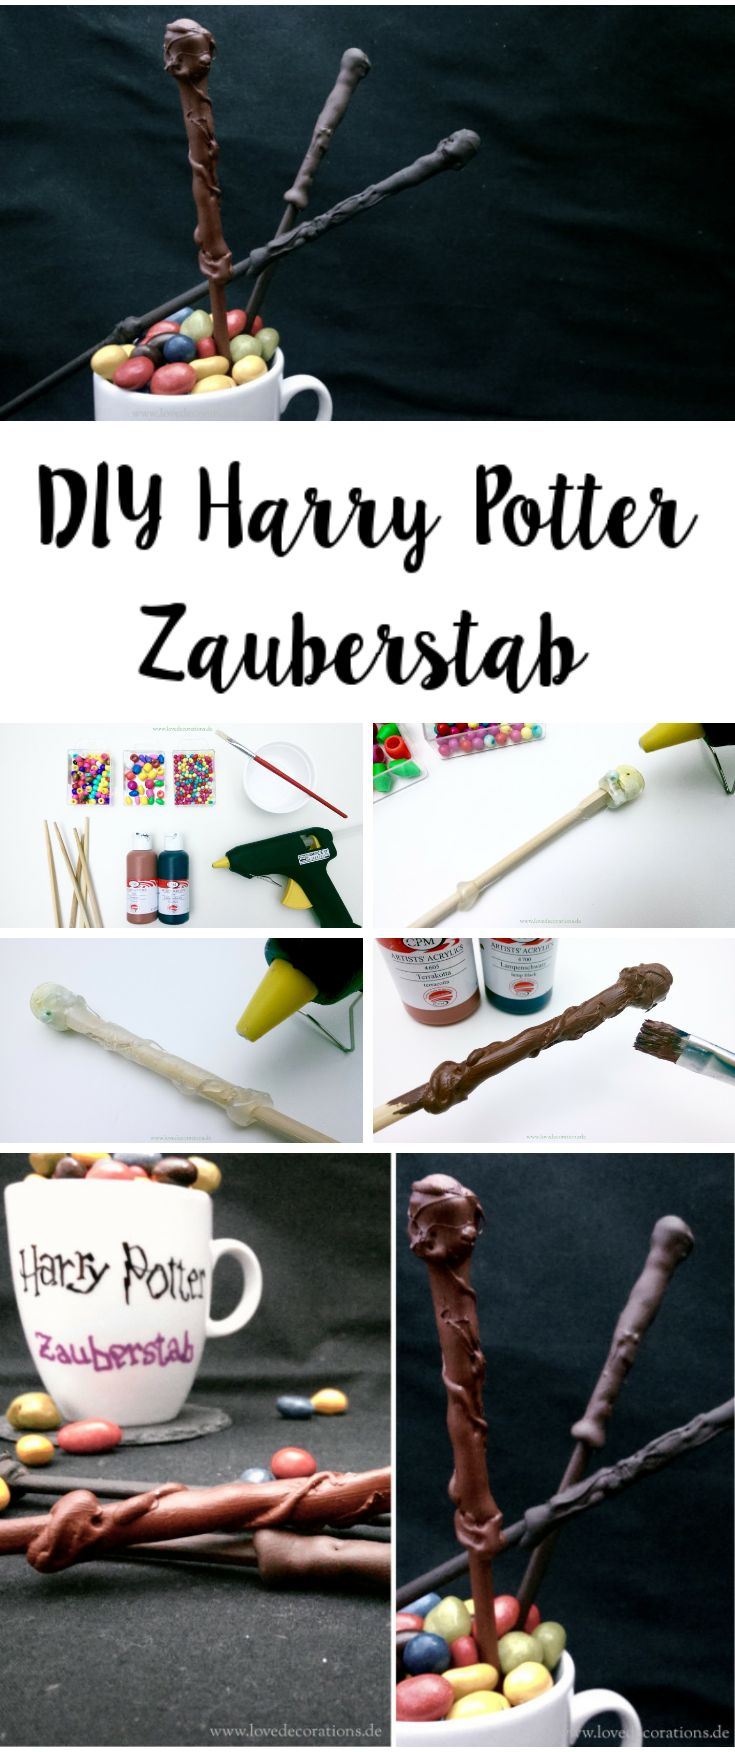 DIY Harry Potter Zauberstab  //  DIY Harry Potter Magic Wands